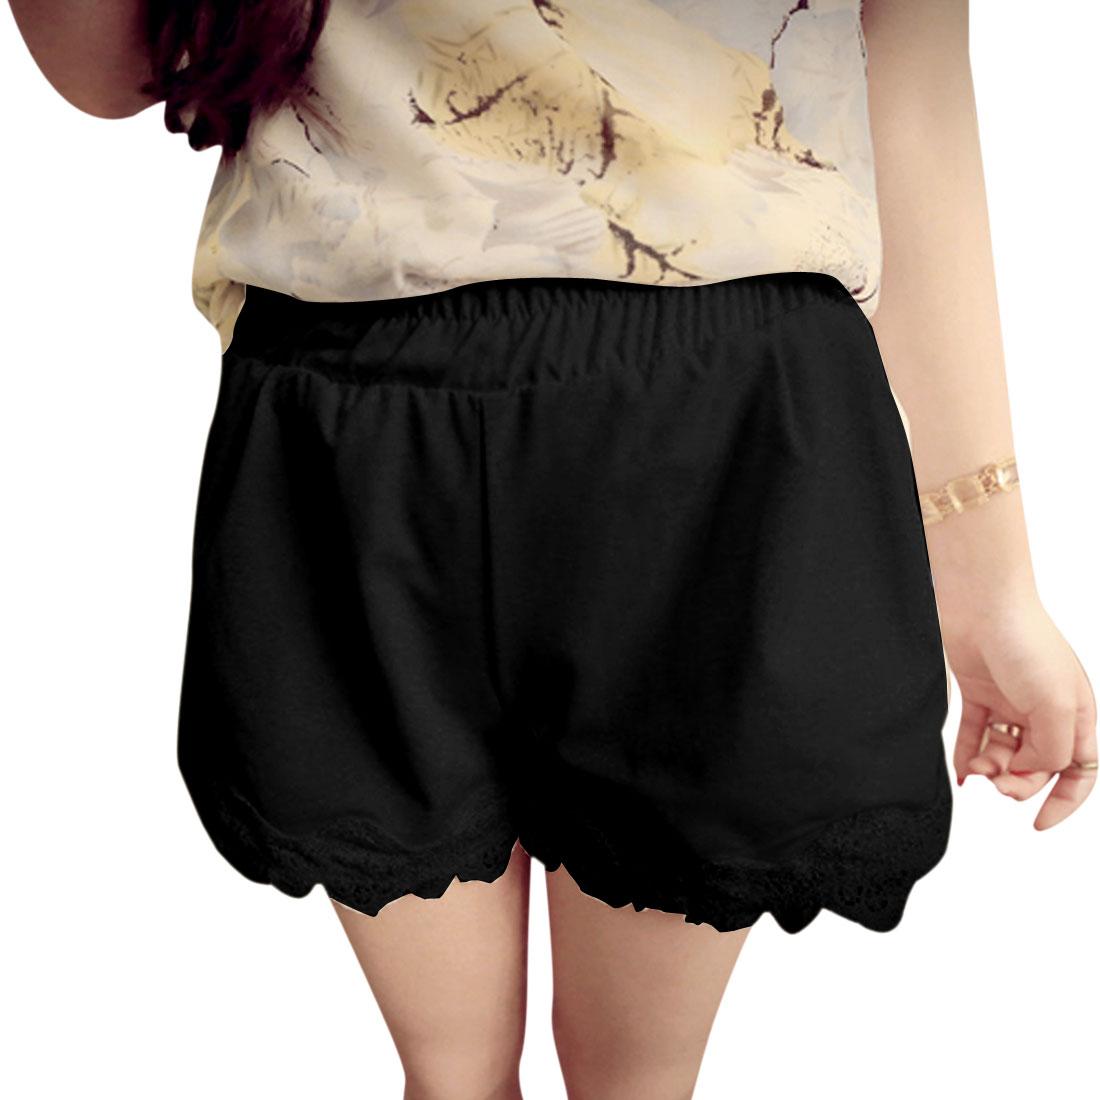 Lady Elastic Waist Zipper Decor Front Crochet Panel Shorts Black S